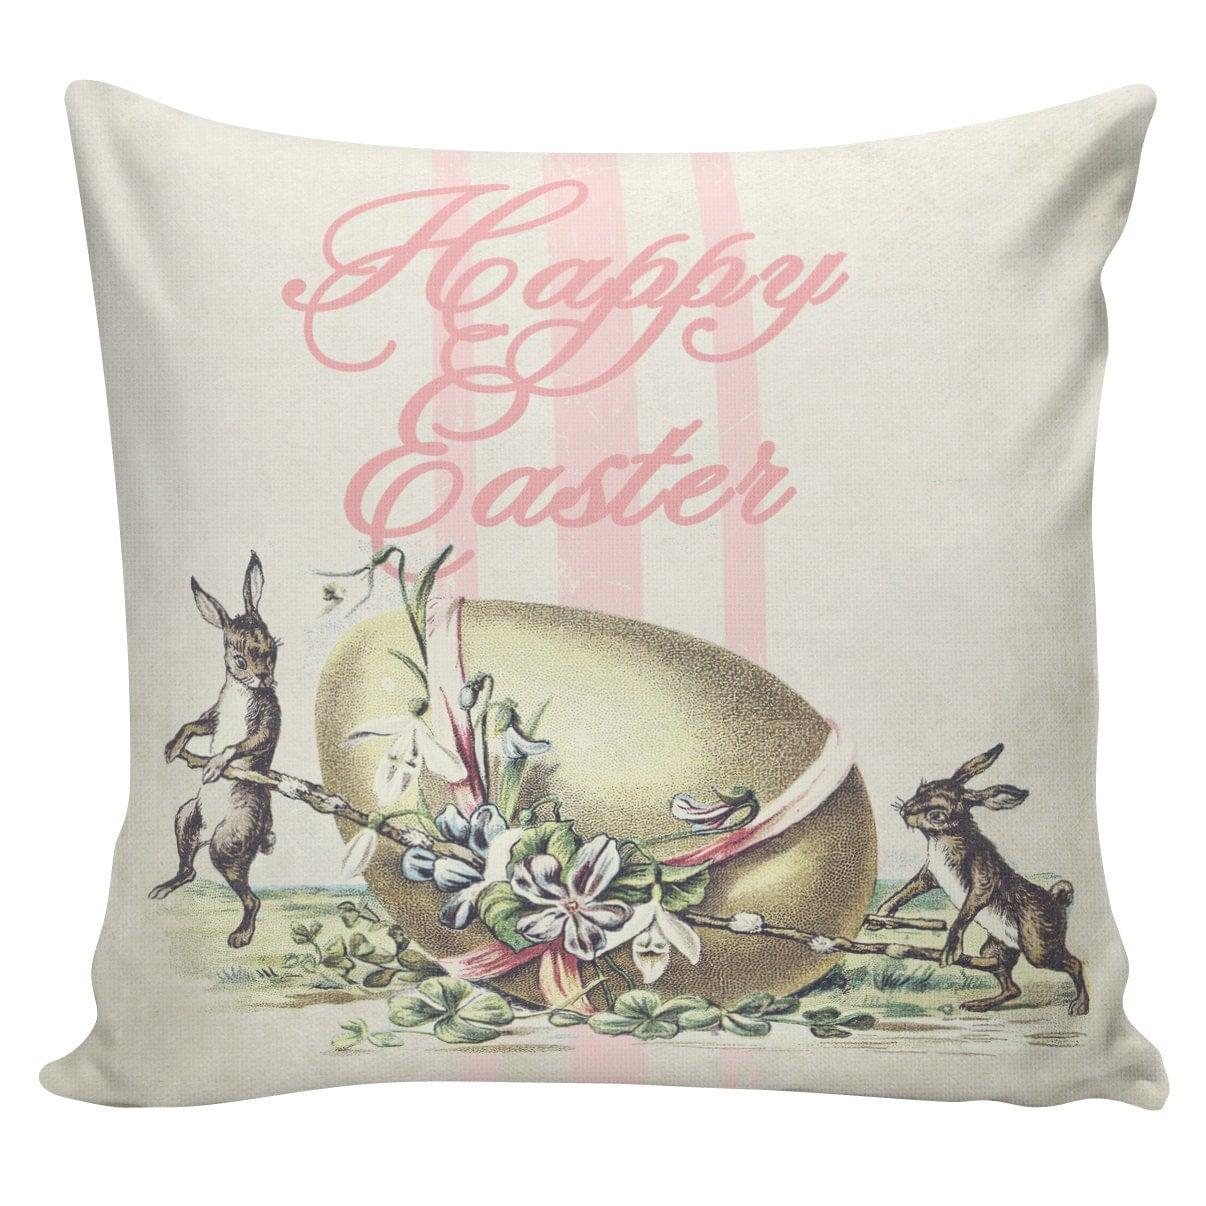 Easter Throw Pillow Covers : Easter Pillows Bunny Pillows Easter Decor Burlap Pillow